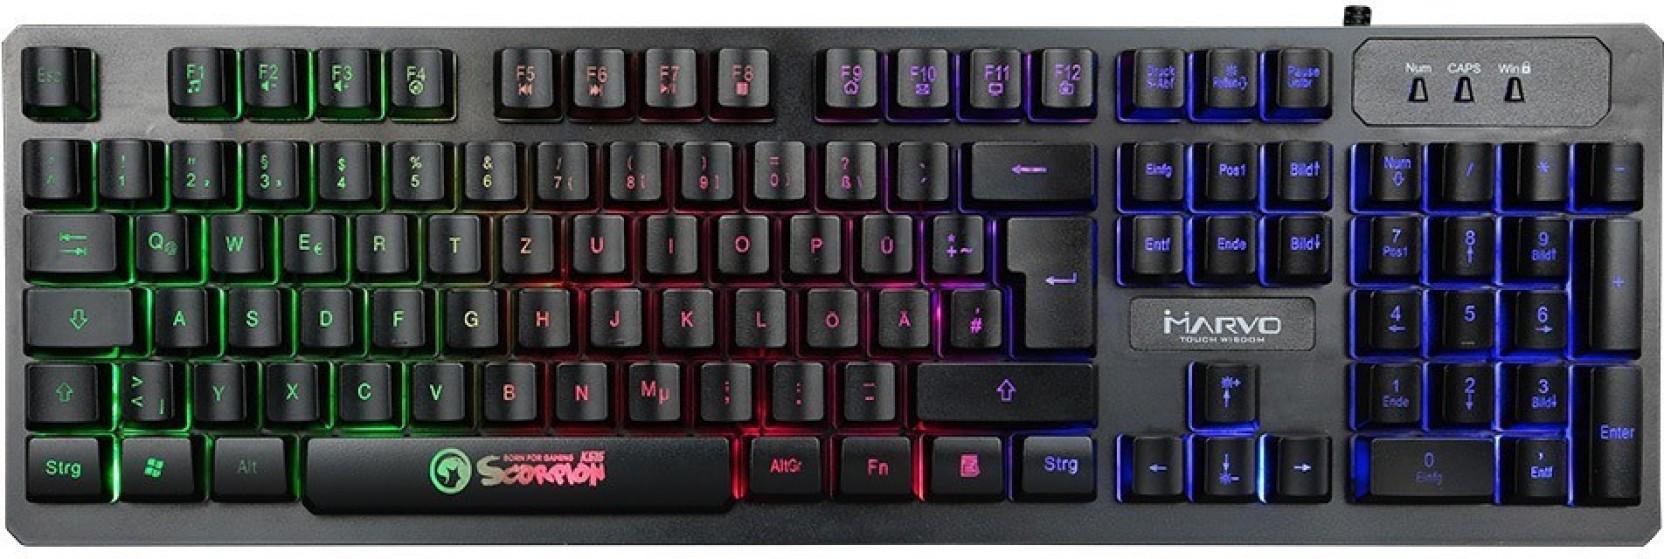 3a9e6c5b804 MARVO K616 Wired USB Gaming Keyboard - MARVO : Flipkart.com